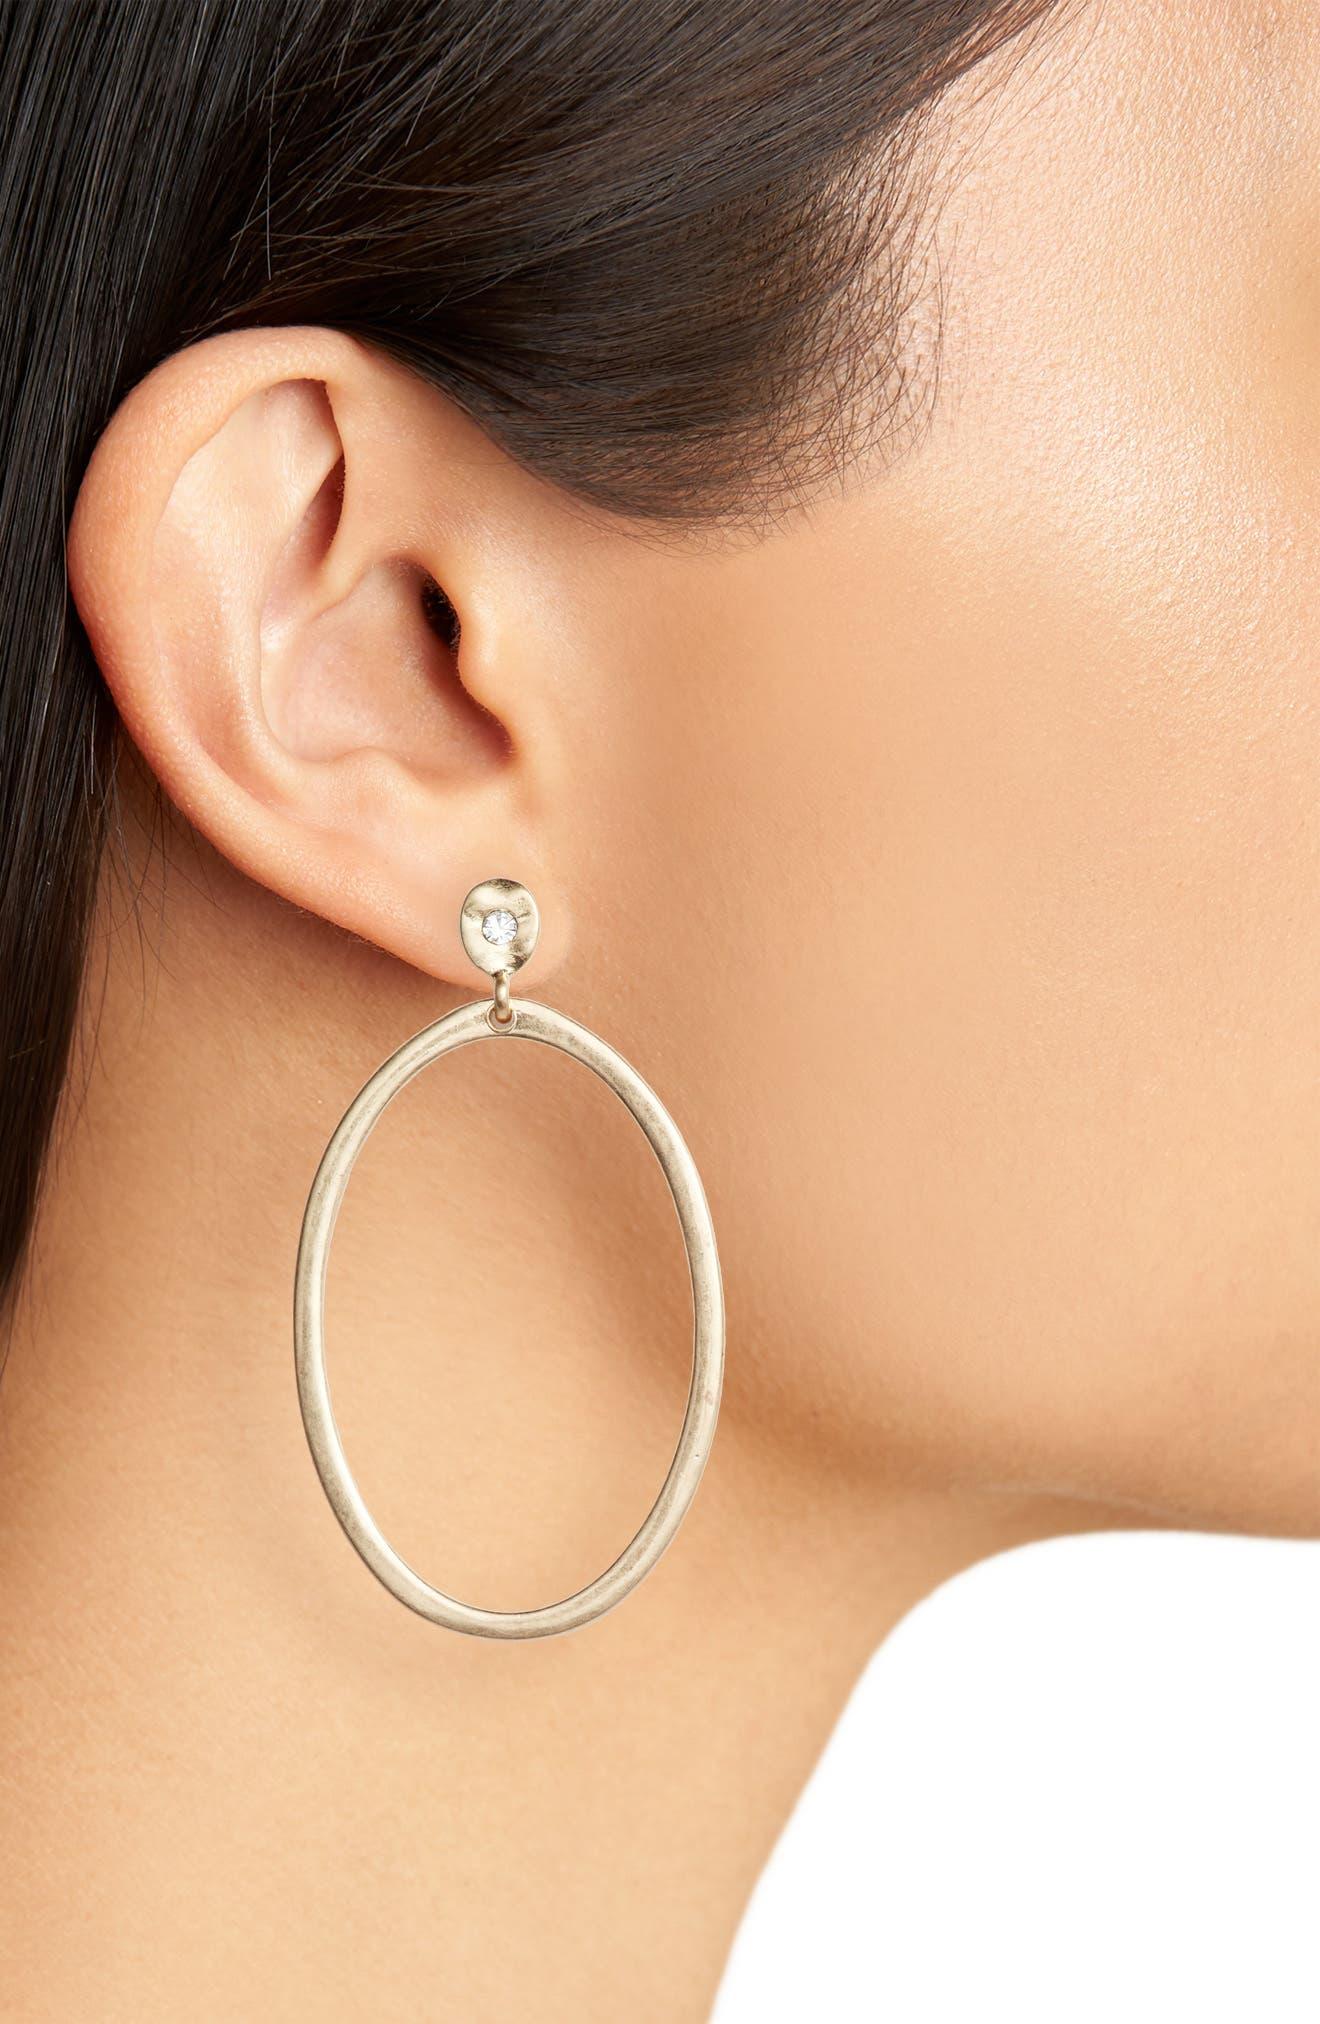 Organic Oval Hoop Earrings,                             Alternate thumbnail 4, color,